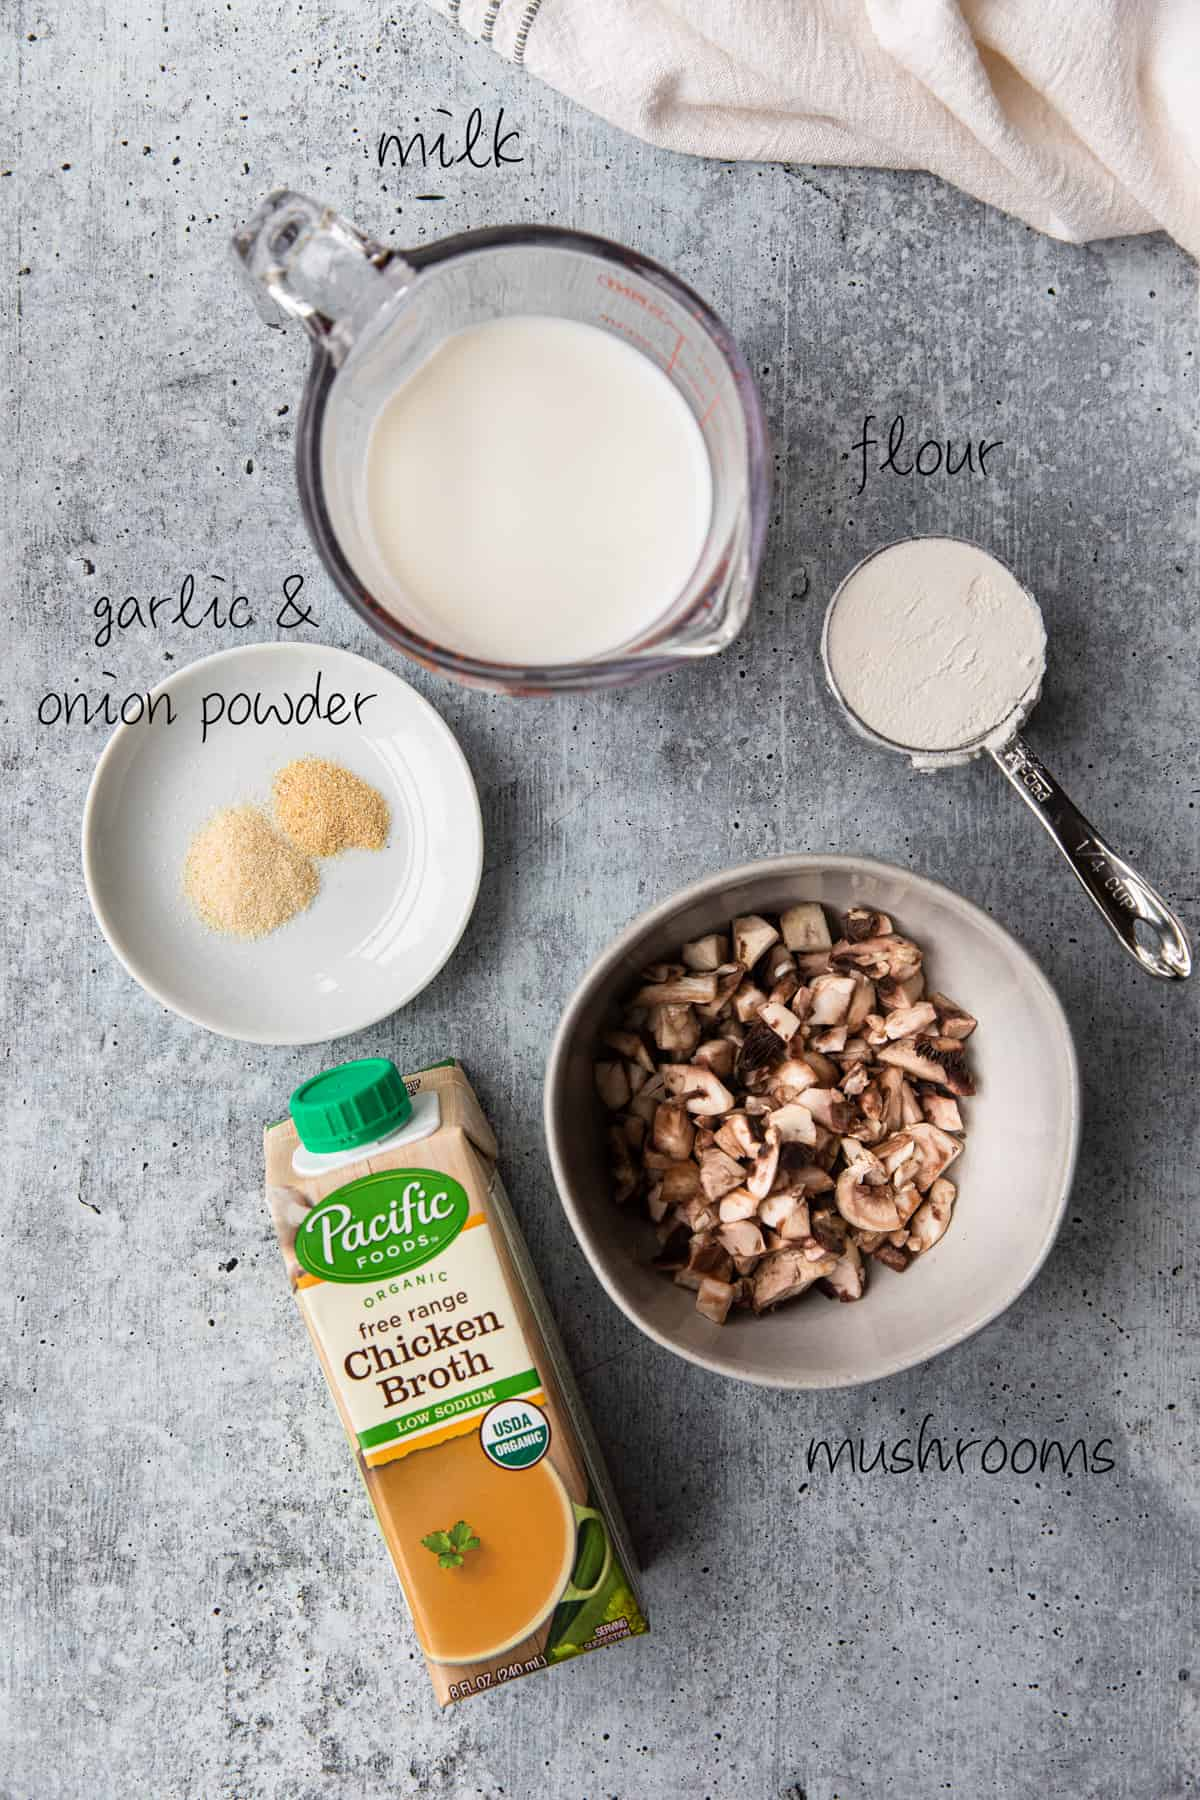 ingredients to make cram of mushroom soup substitute